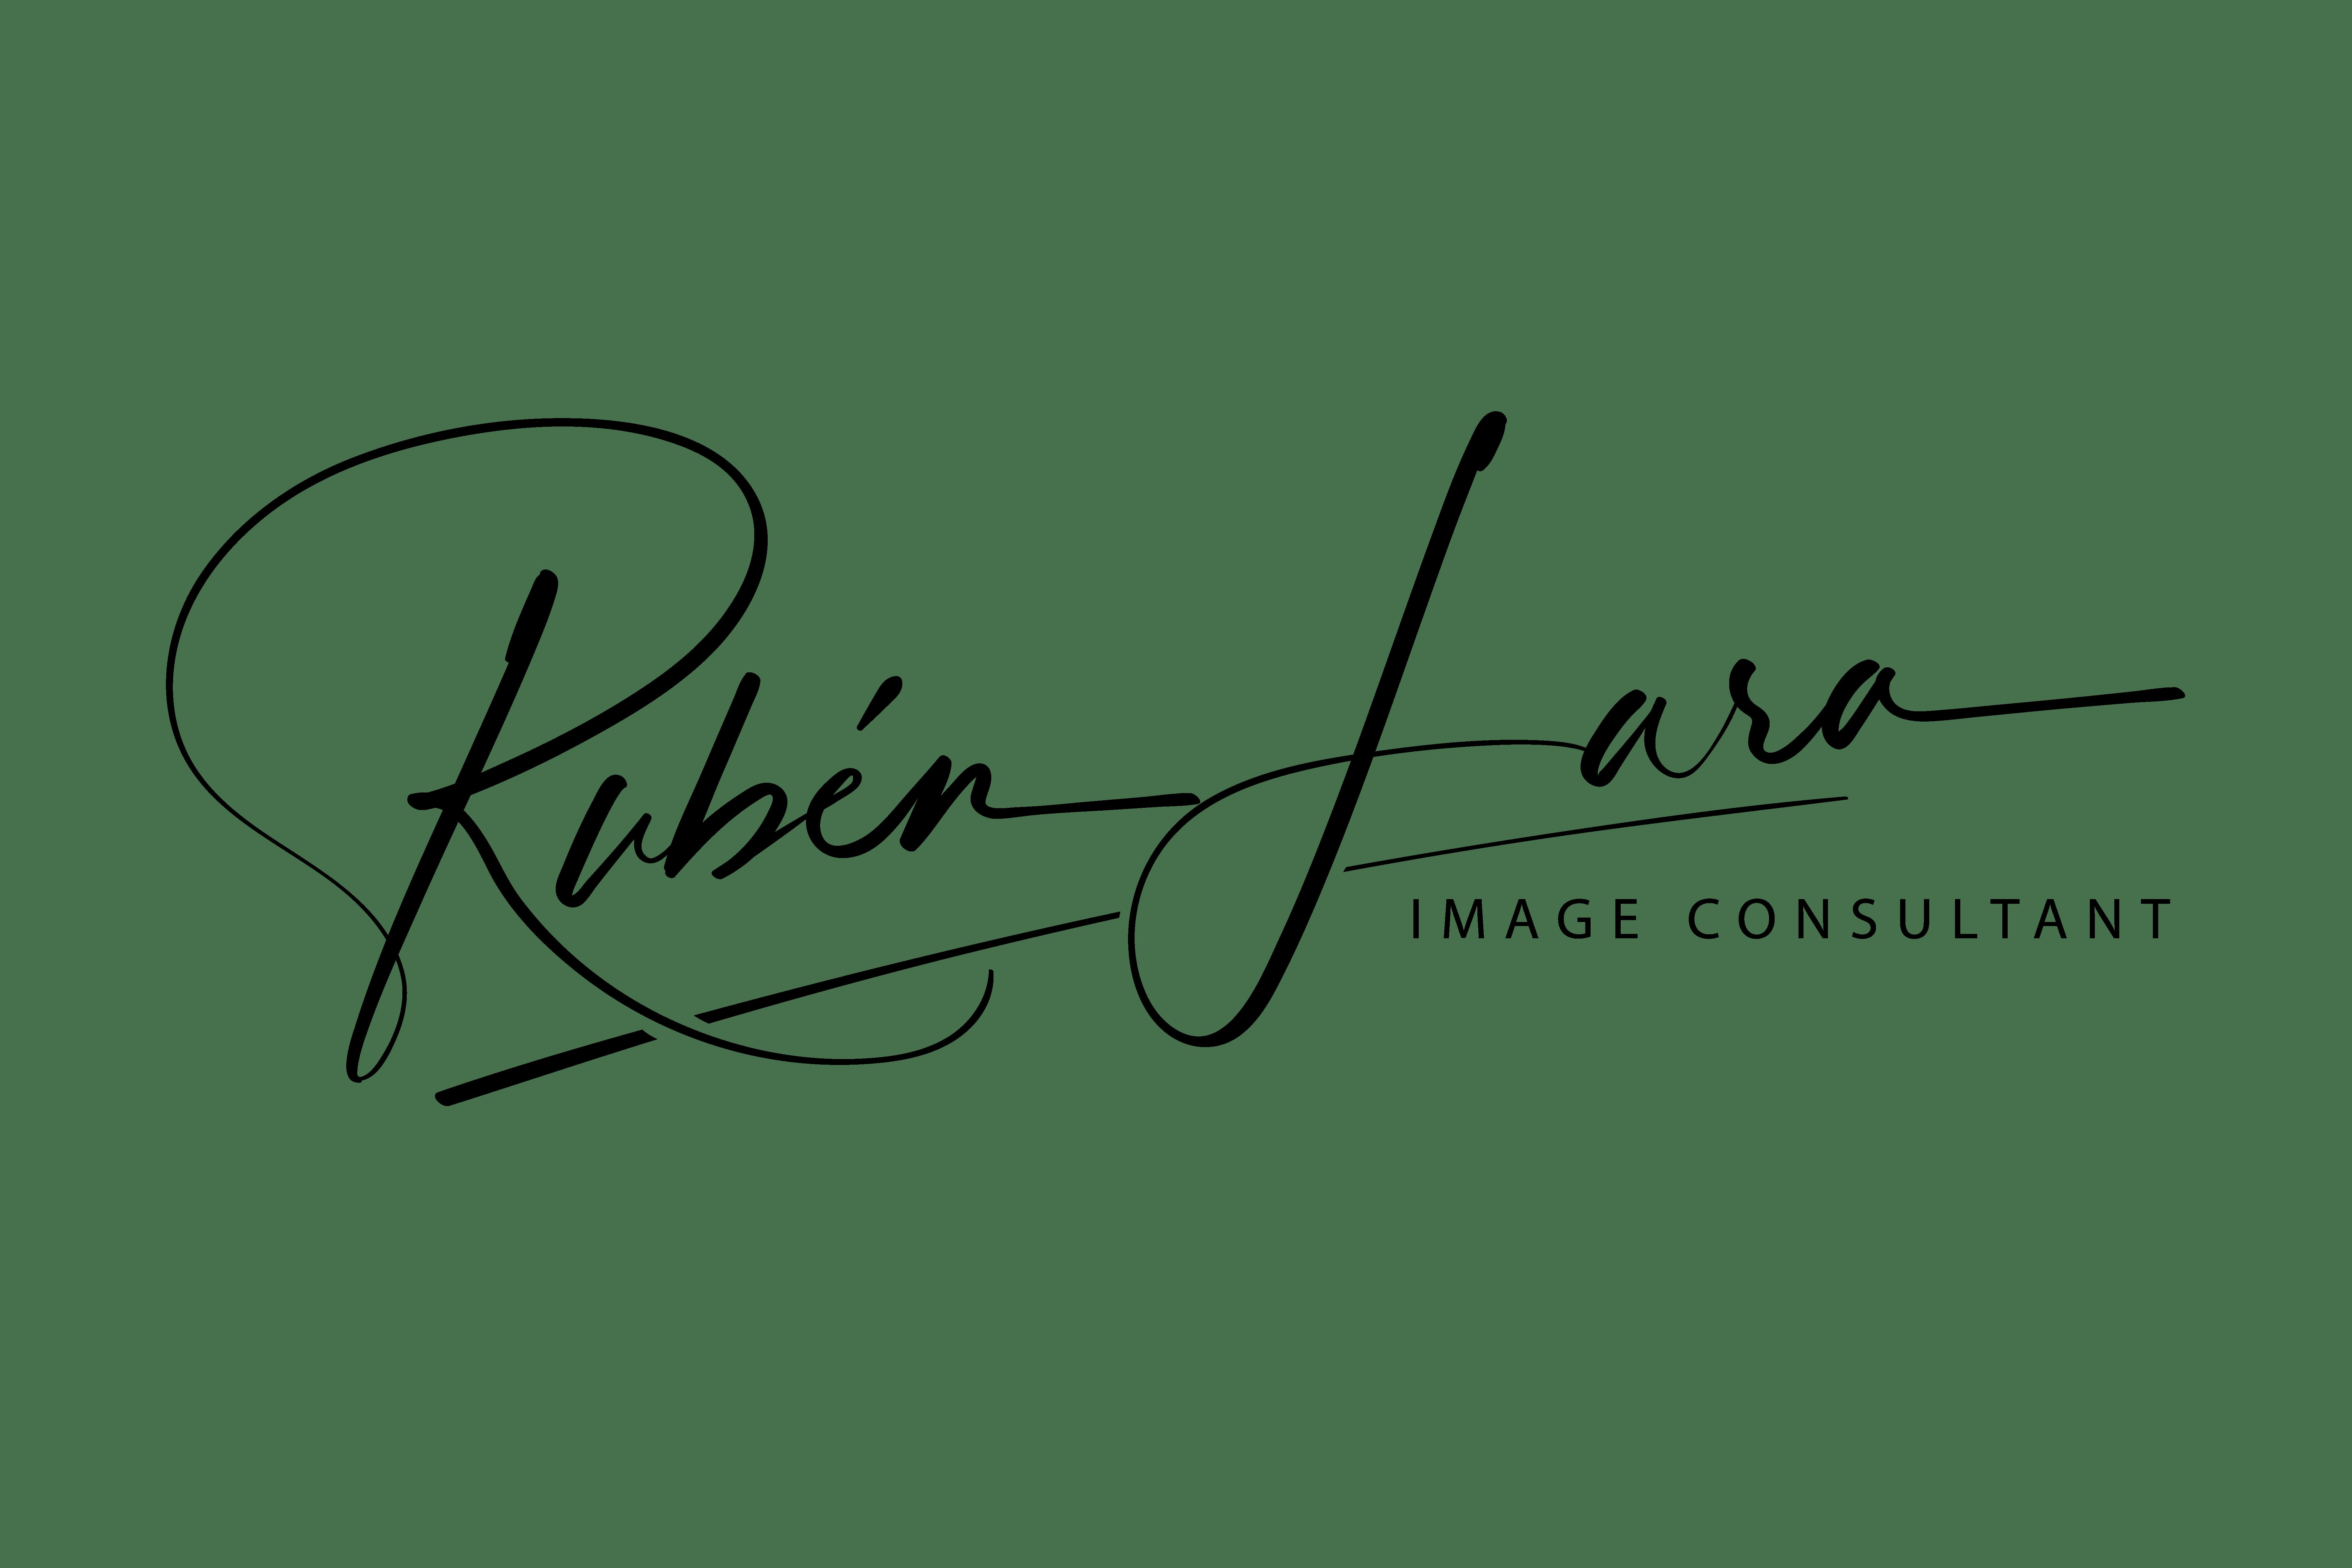 Rubén Lara Black Signature